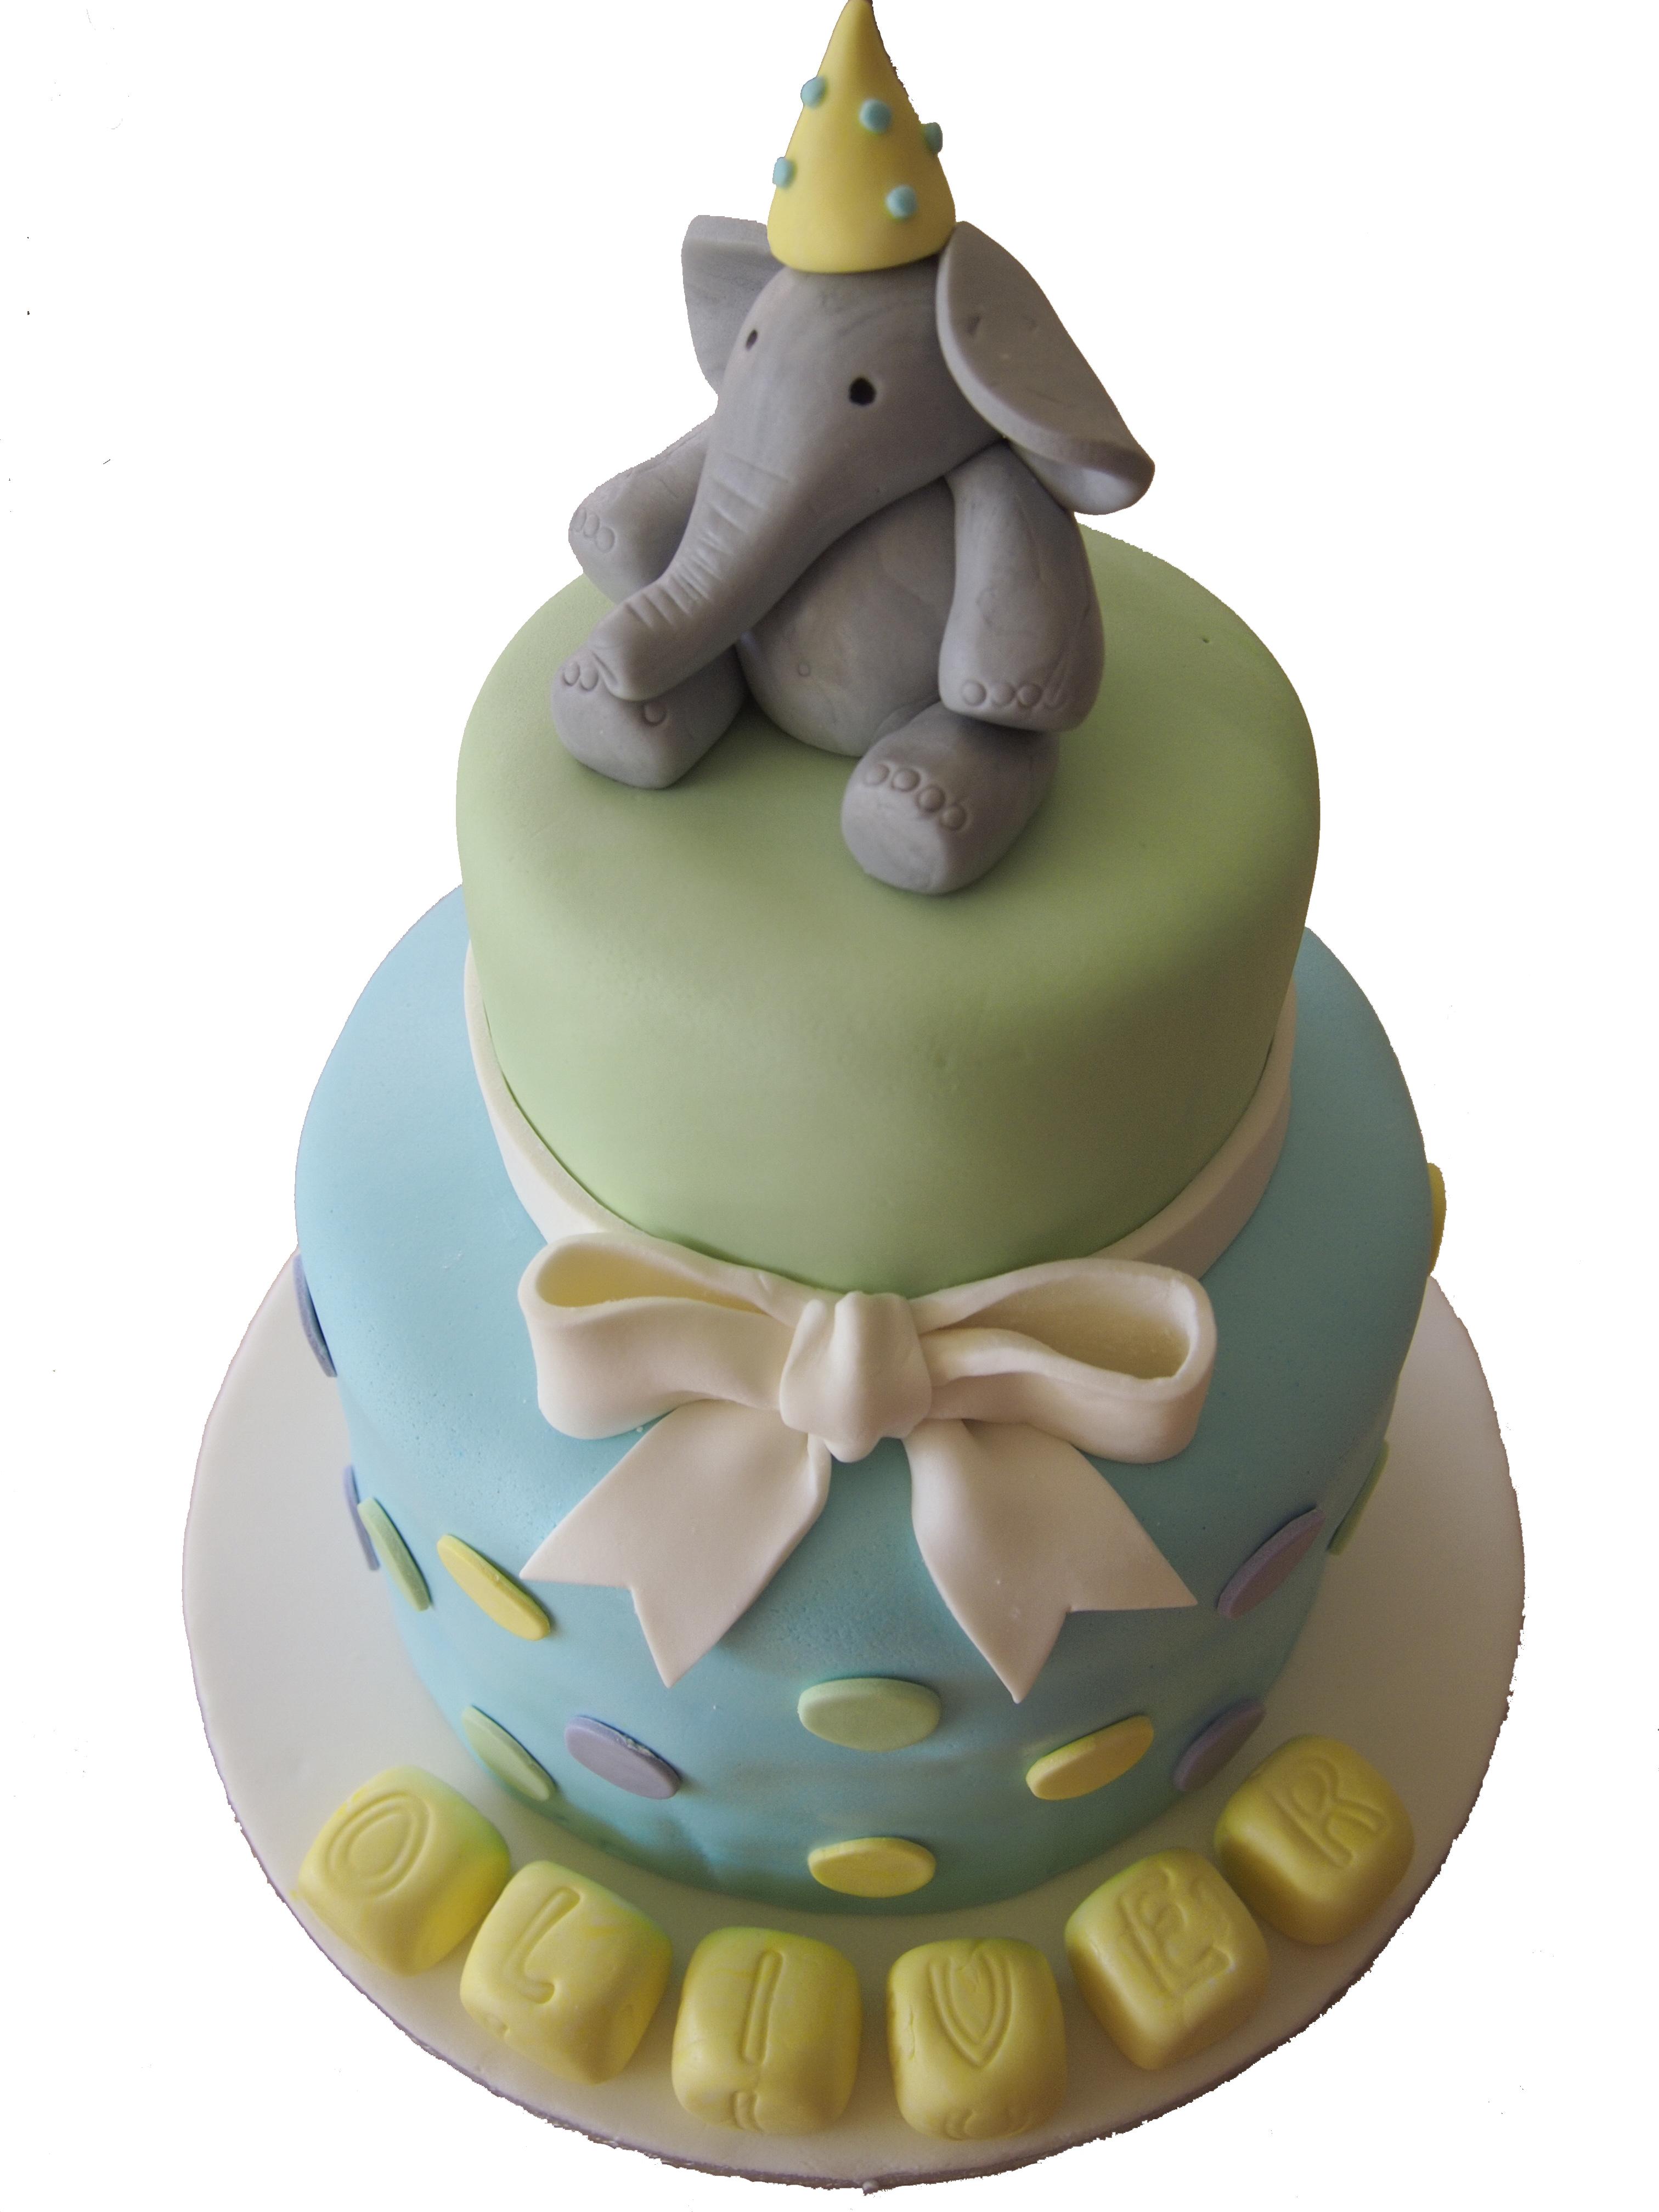 Elephant Cake Topper Confessions Of A Cake Addict